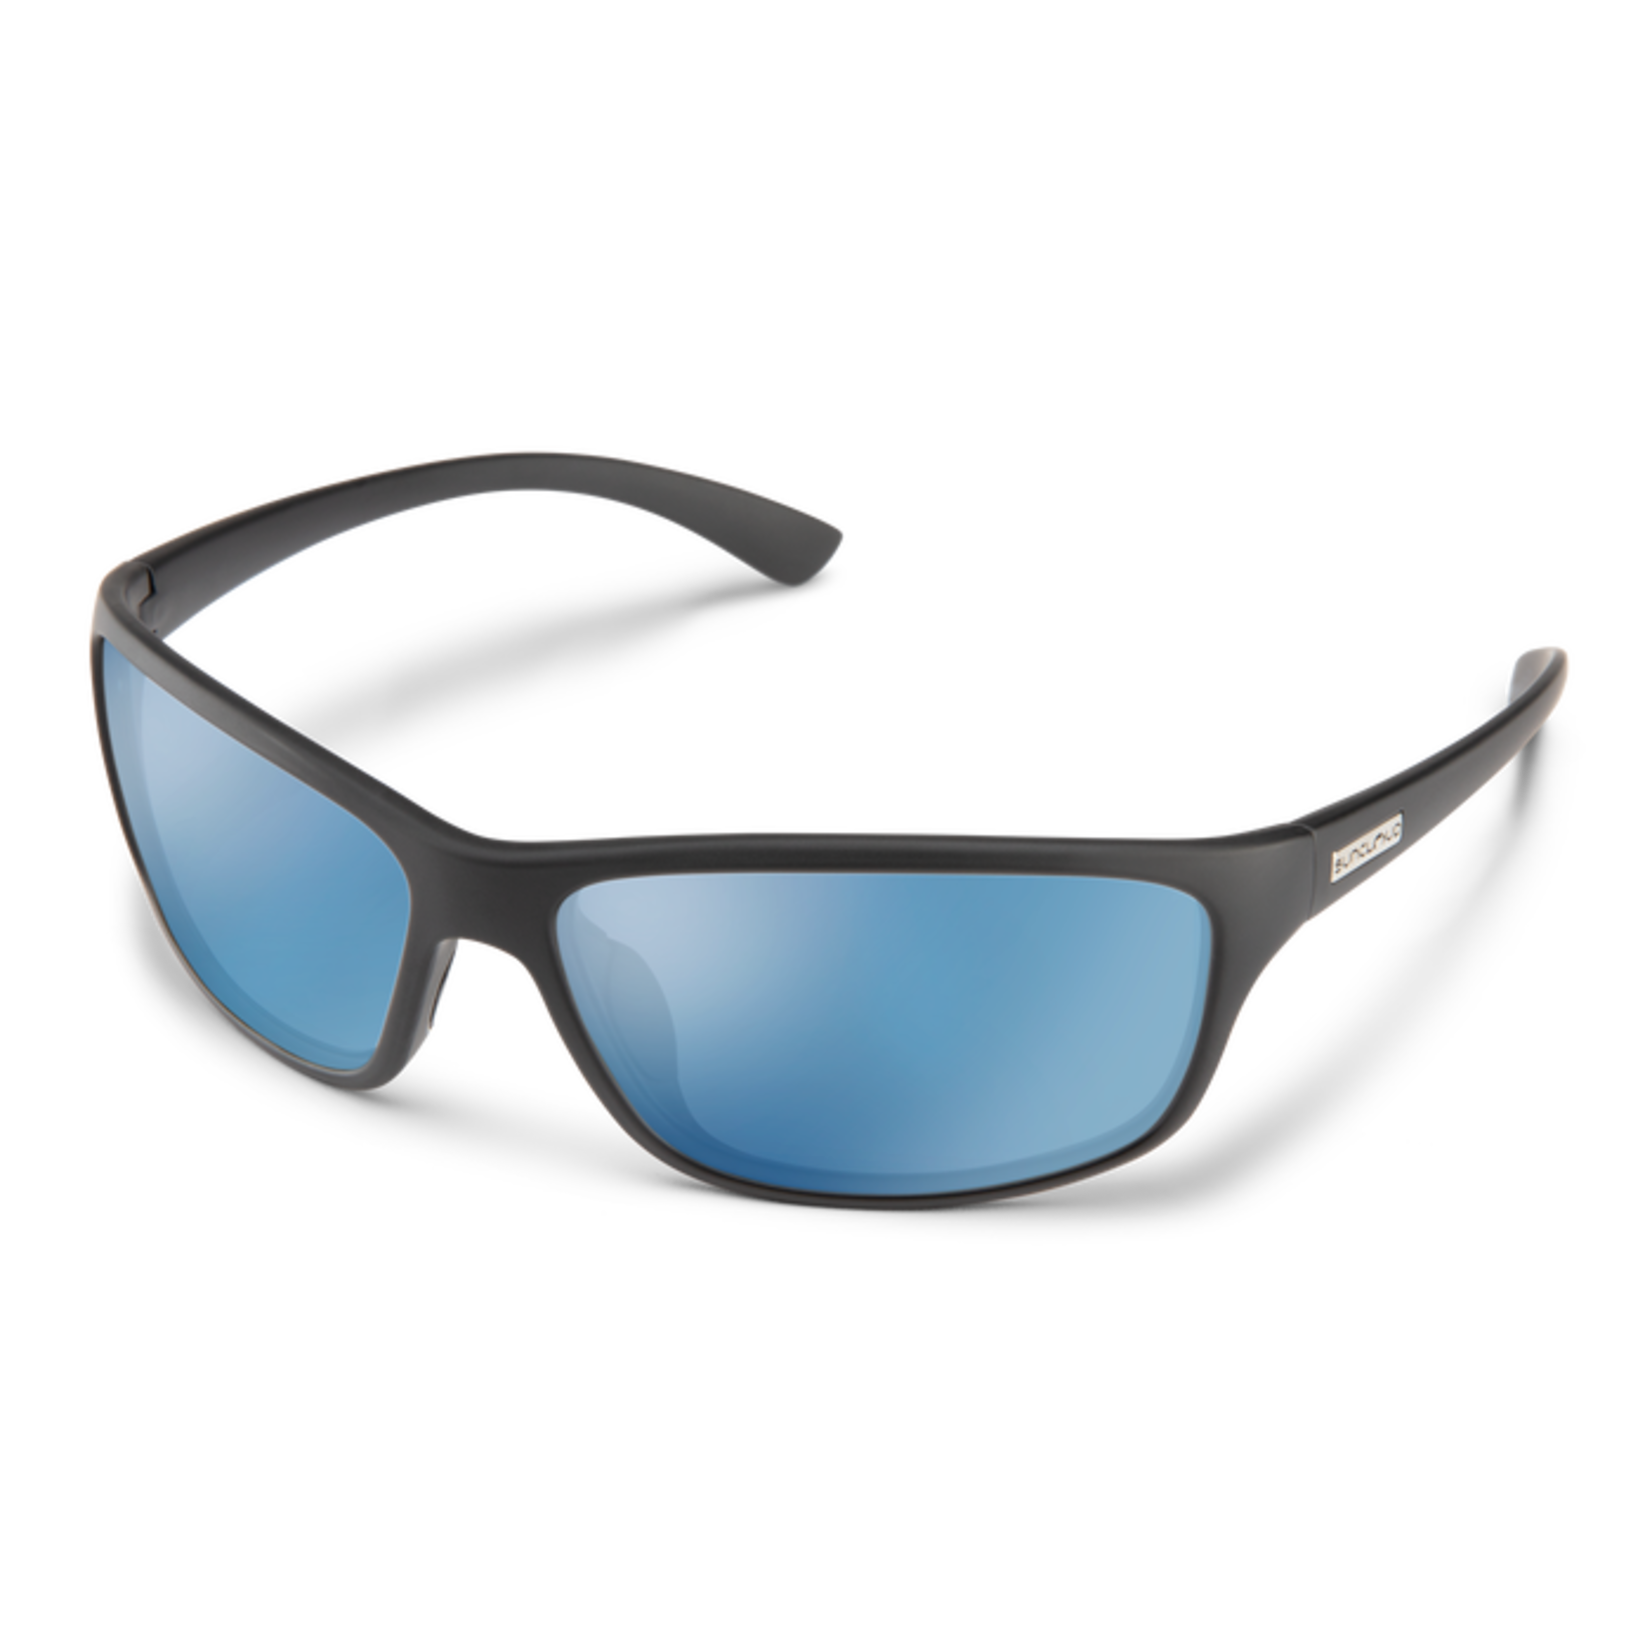 Suncloud Optics Suncloud Sentry Polarized Sunglasses